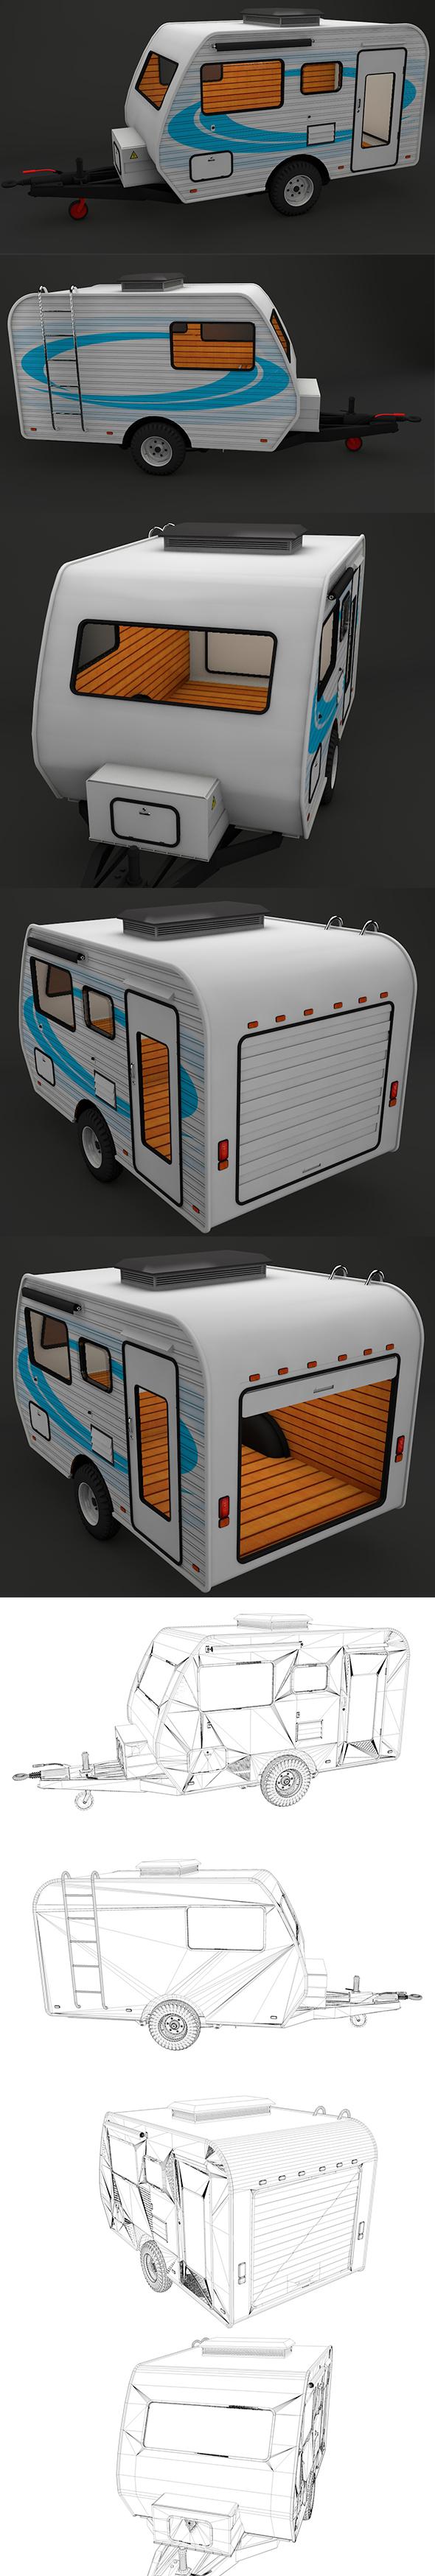 Caravan House Car - FULL Edition with Textures 1080 - 3DOcean Item for Sale